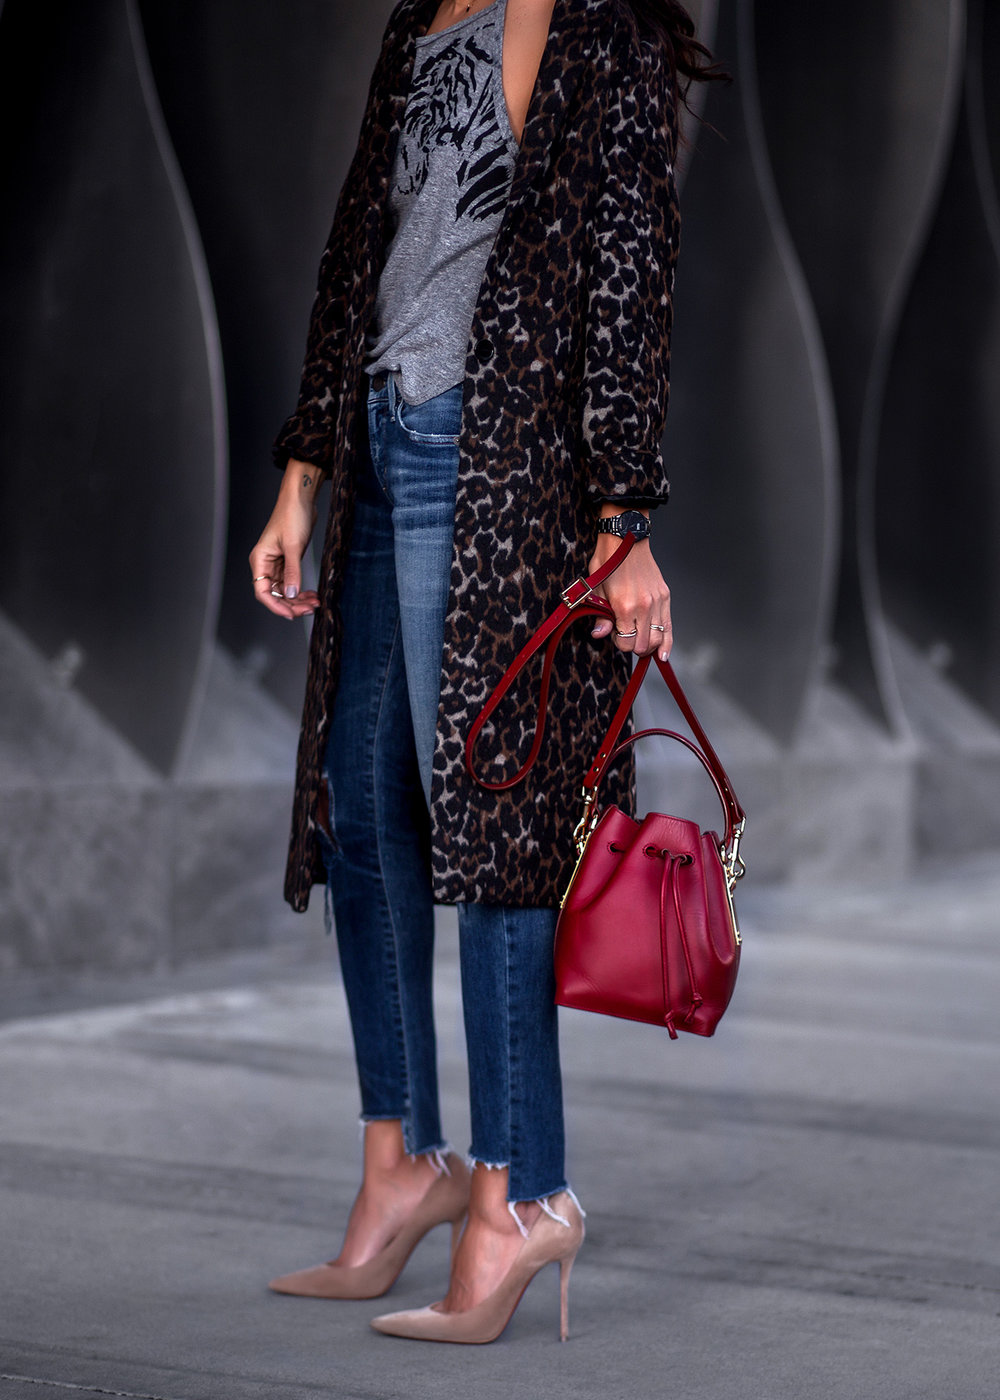 Nakd_Fashion_Leopard_Coat_Louboutin_Sophie_Hume.jpg